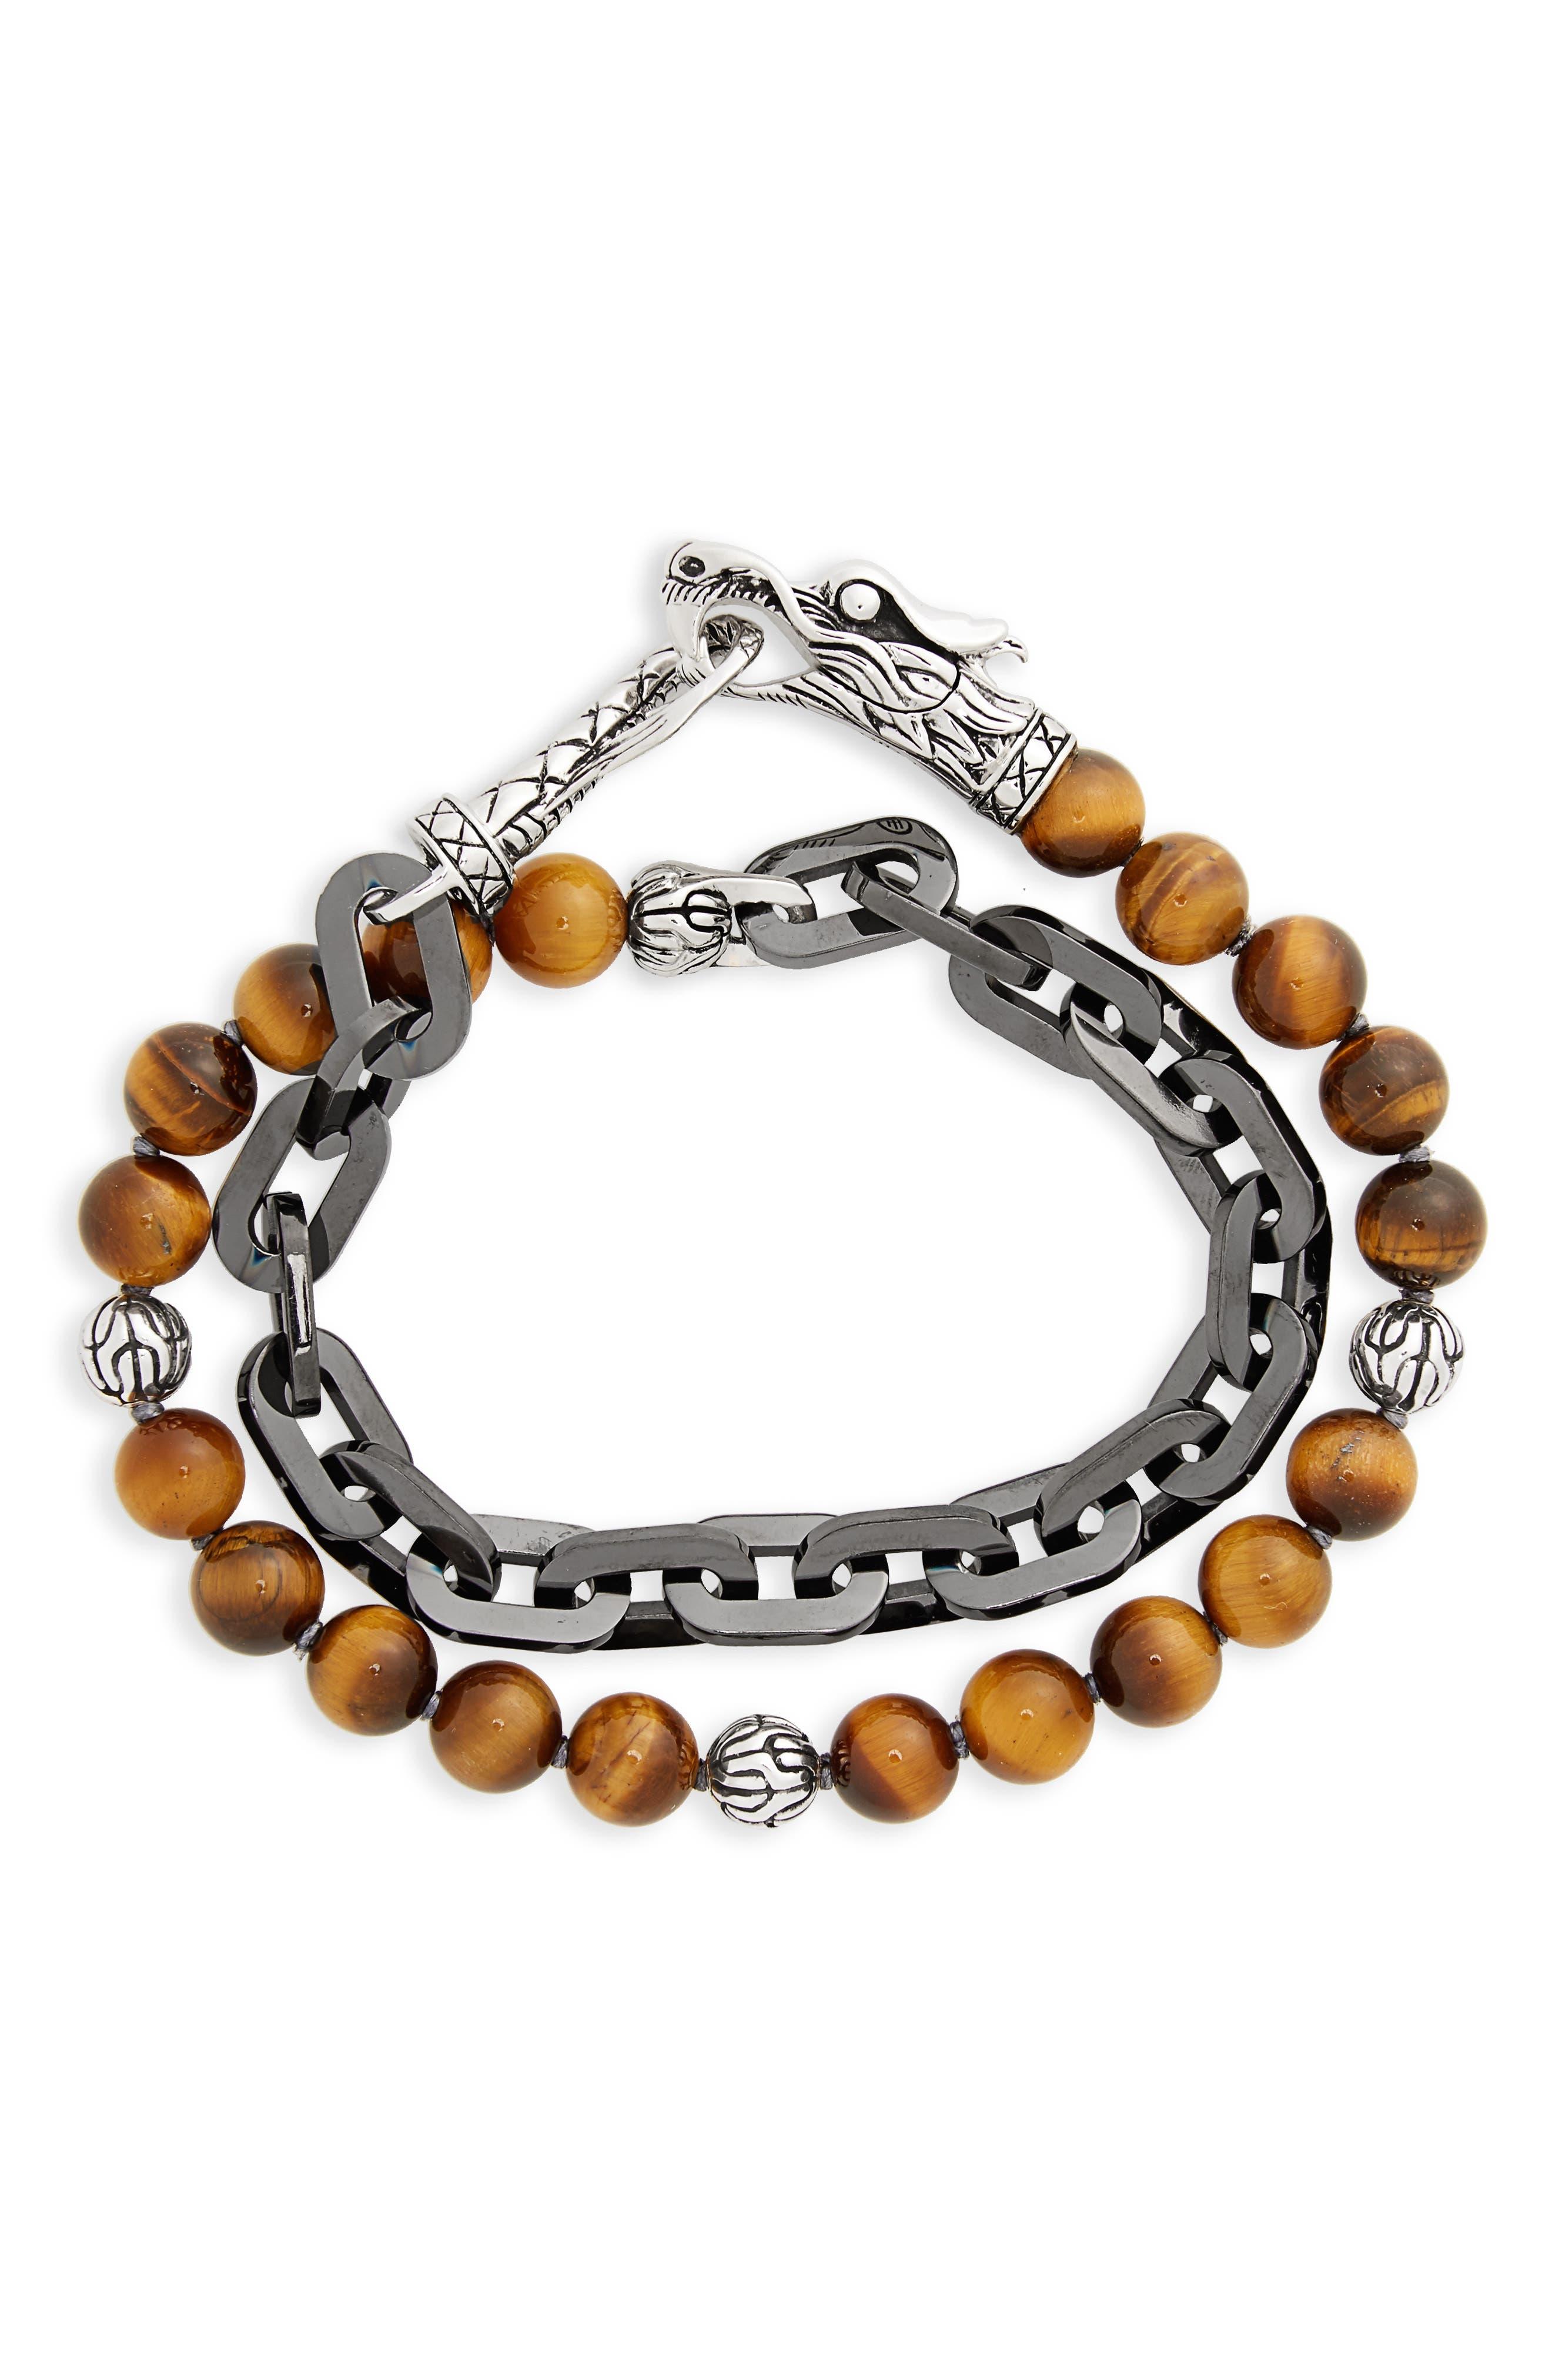 Main Image - John Hardy Legends Naga Double Wrap Link Bracelet